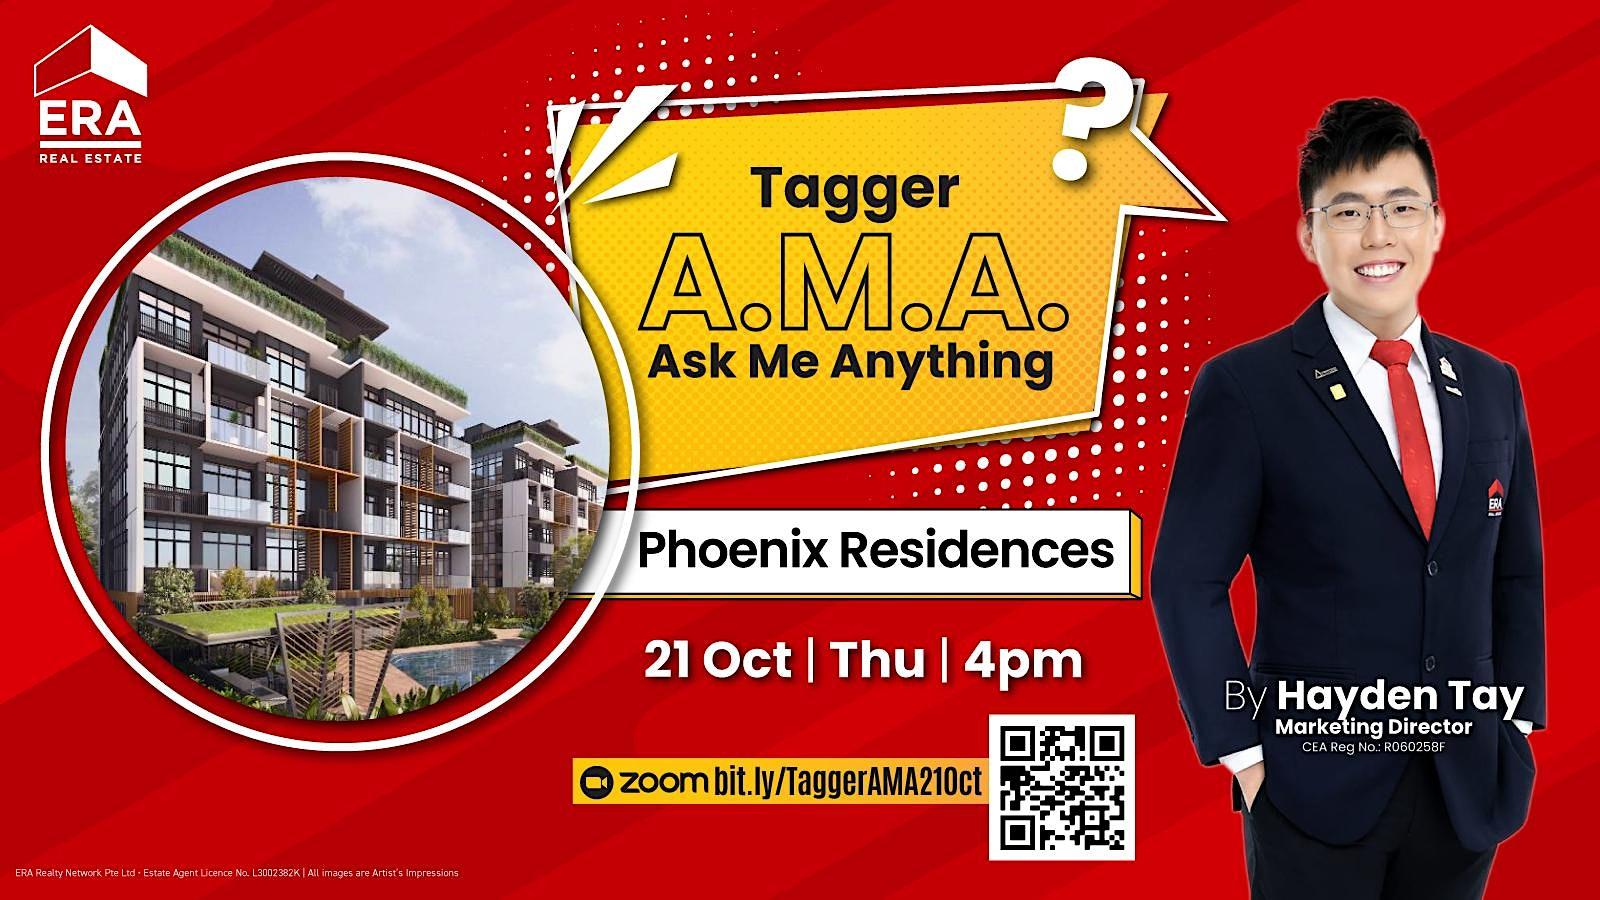 Tagger A.M.A  Pheonix Residences